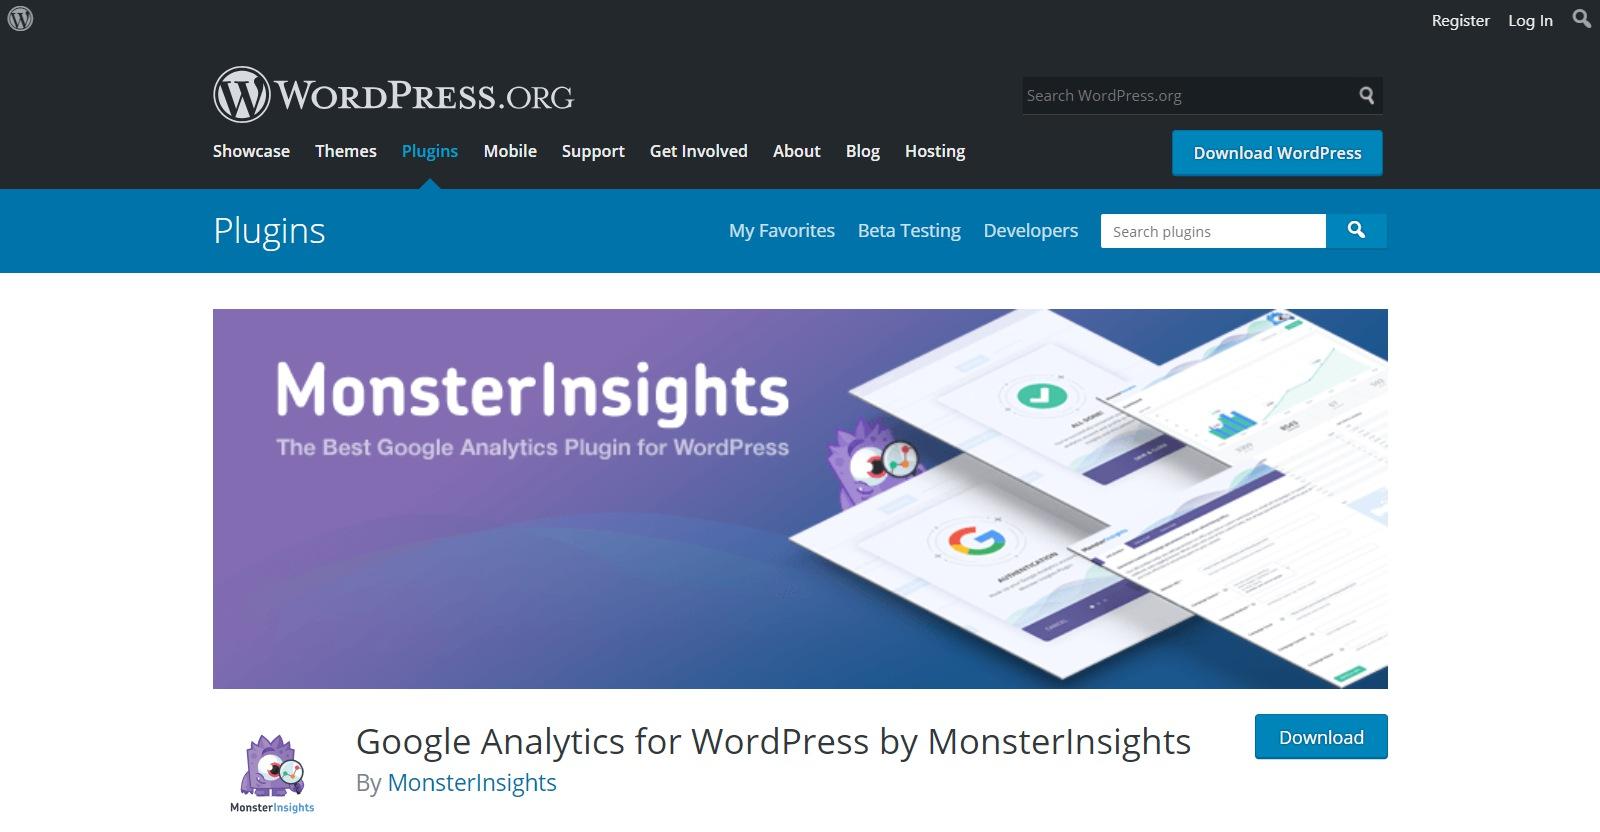 Plugins gratuitos de WordPress monsterinsights